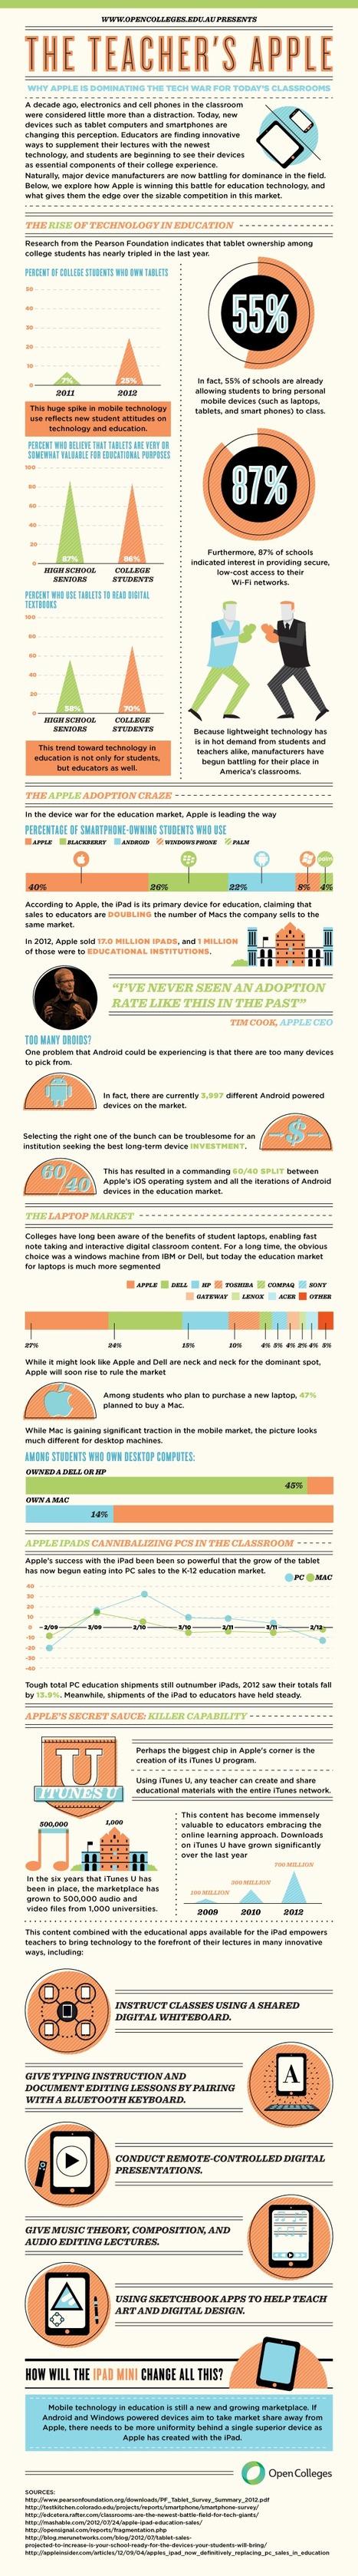 The Teacher's Apple [Infographic] | ENT | Scoop.it